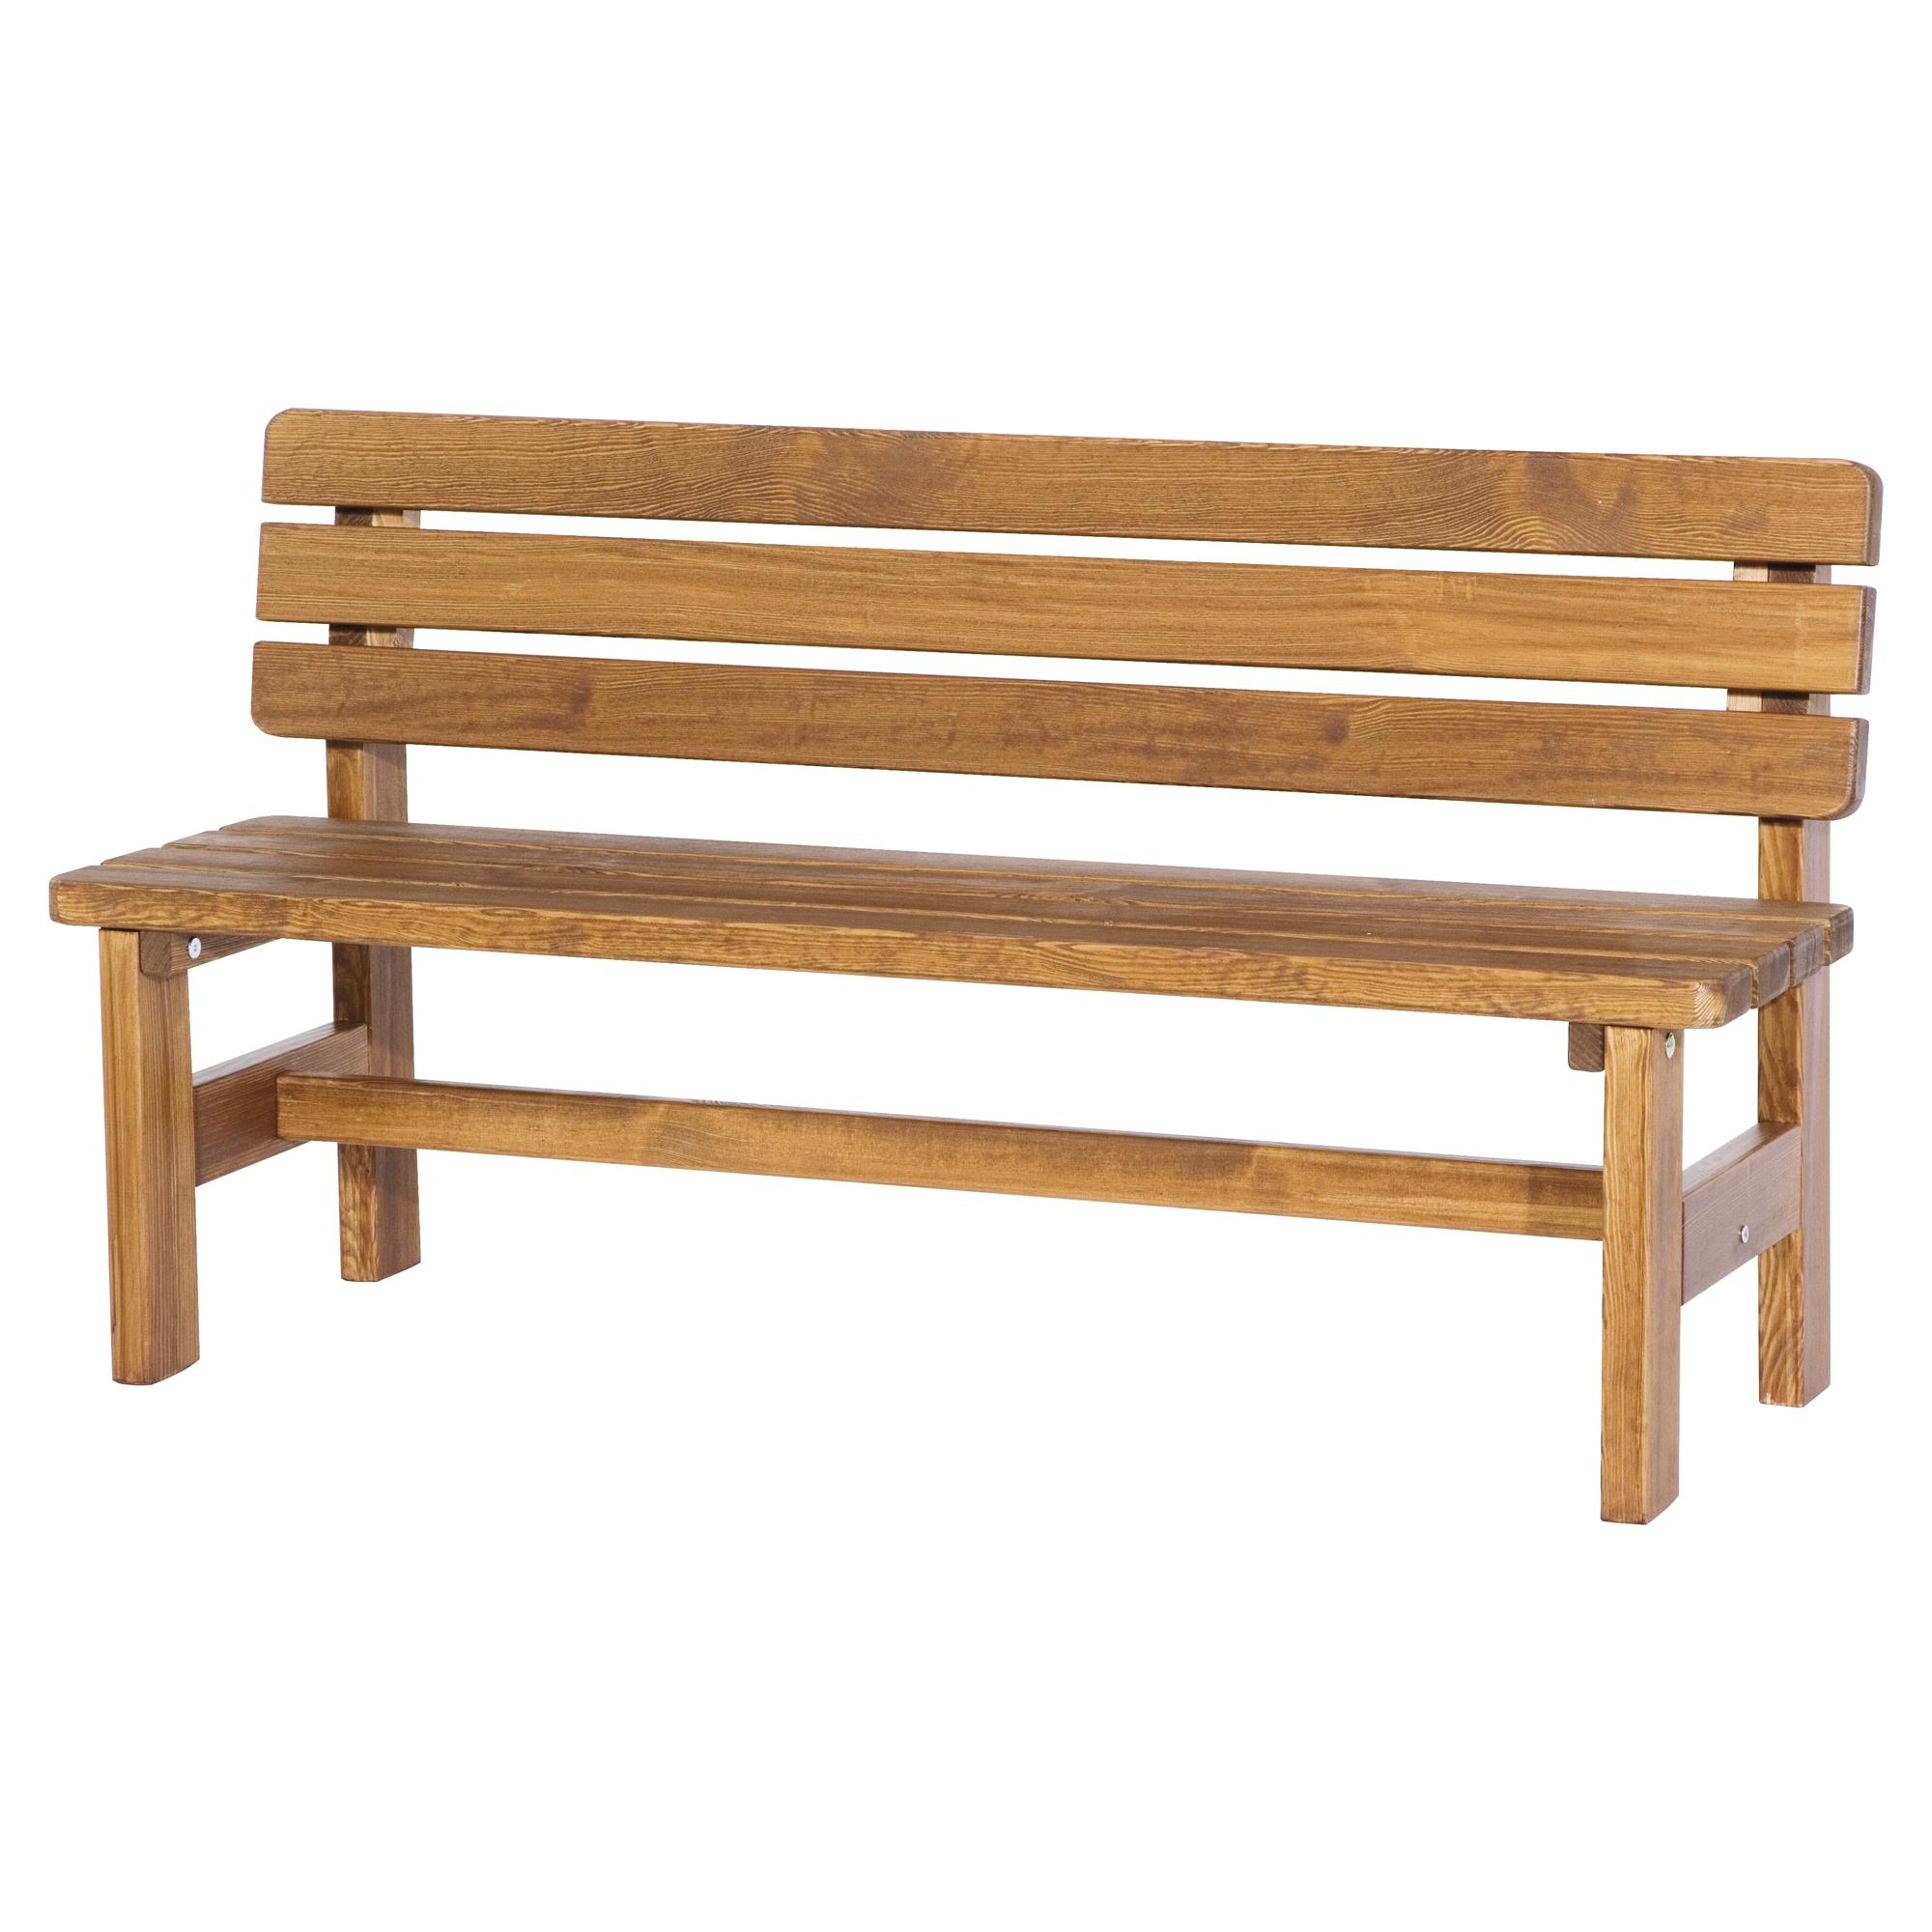 "Gartenbank ""Tessin"" Holz 150 X 80 X 41 Cm | Toom Baumarkt"